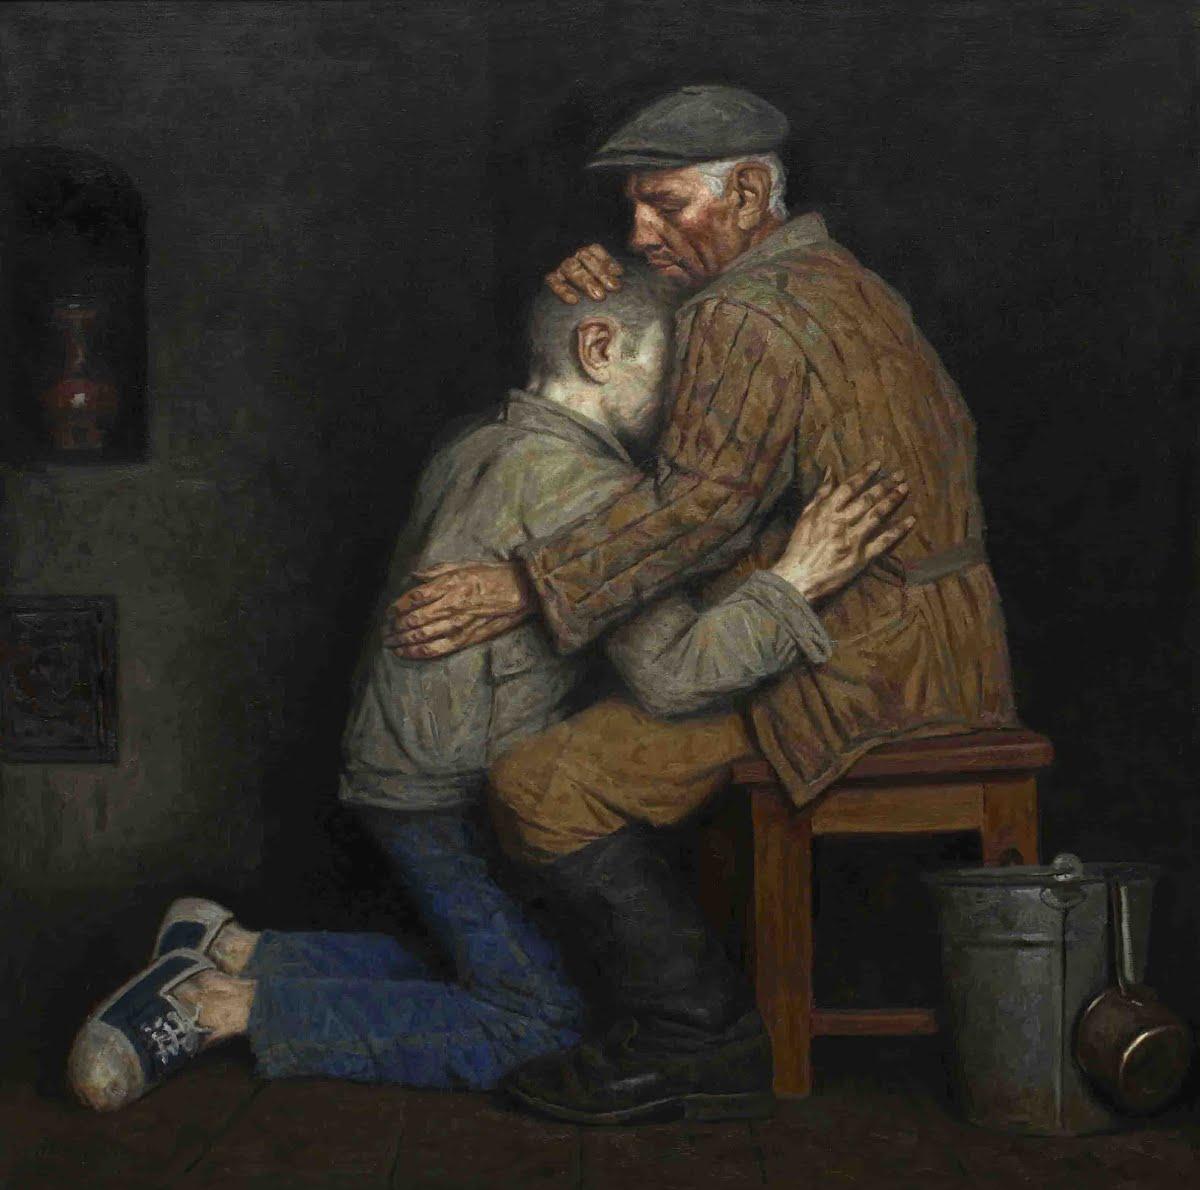 The Prodigal Son - Gely Korzhev — Google Arts & Culture